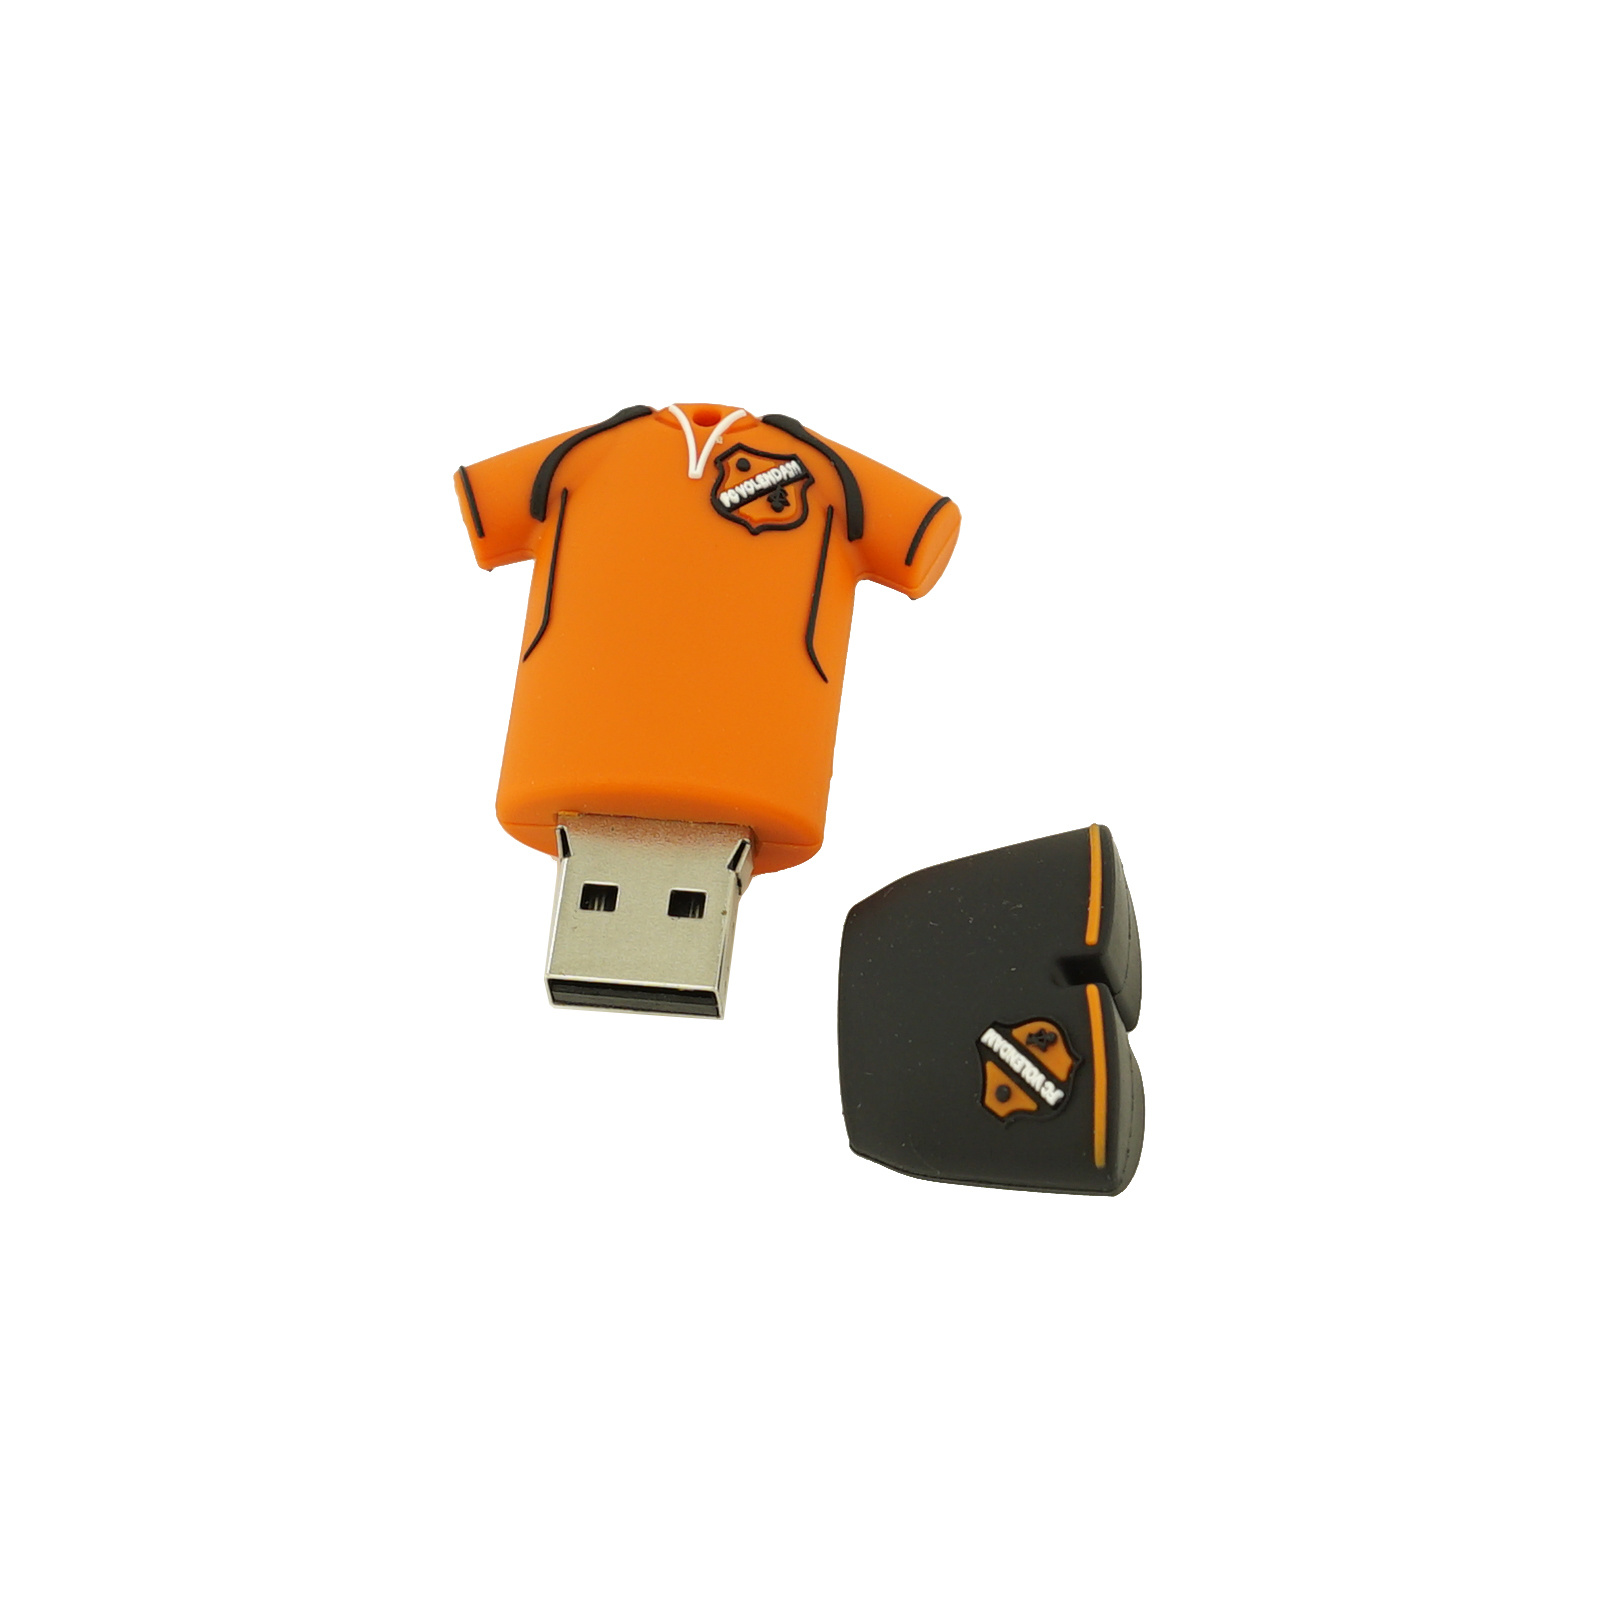 USB stick shirt